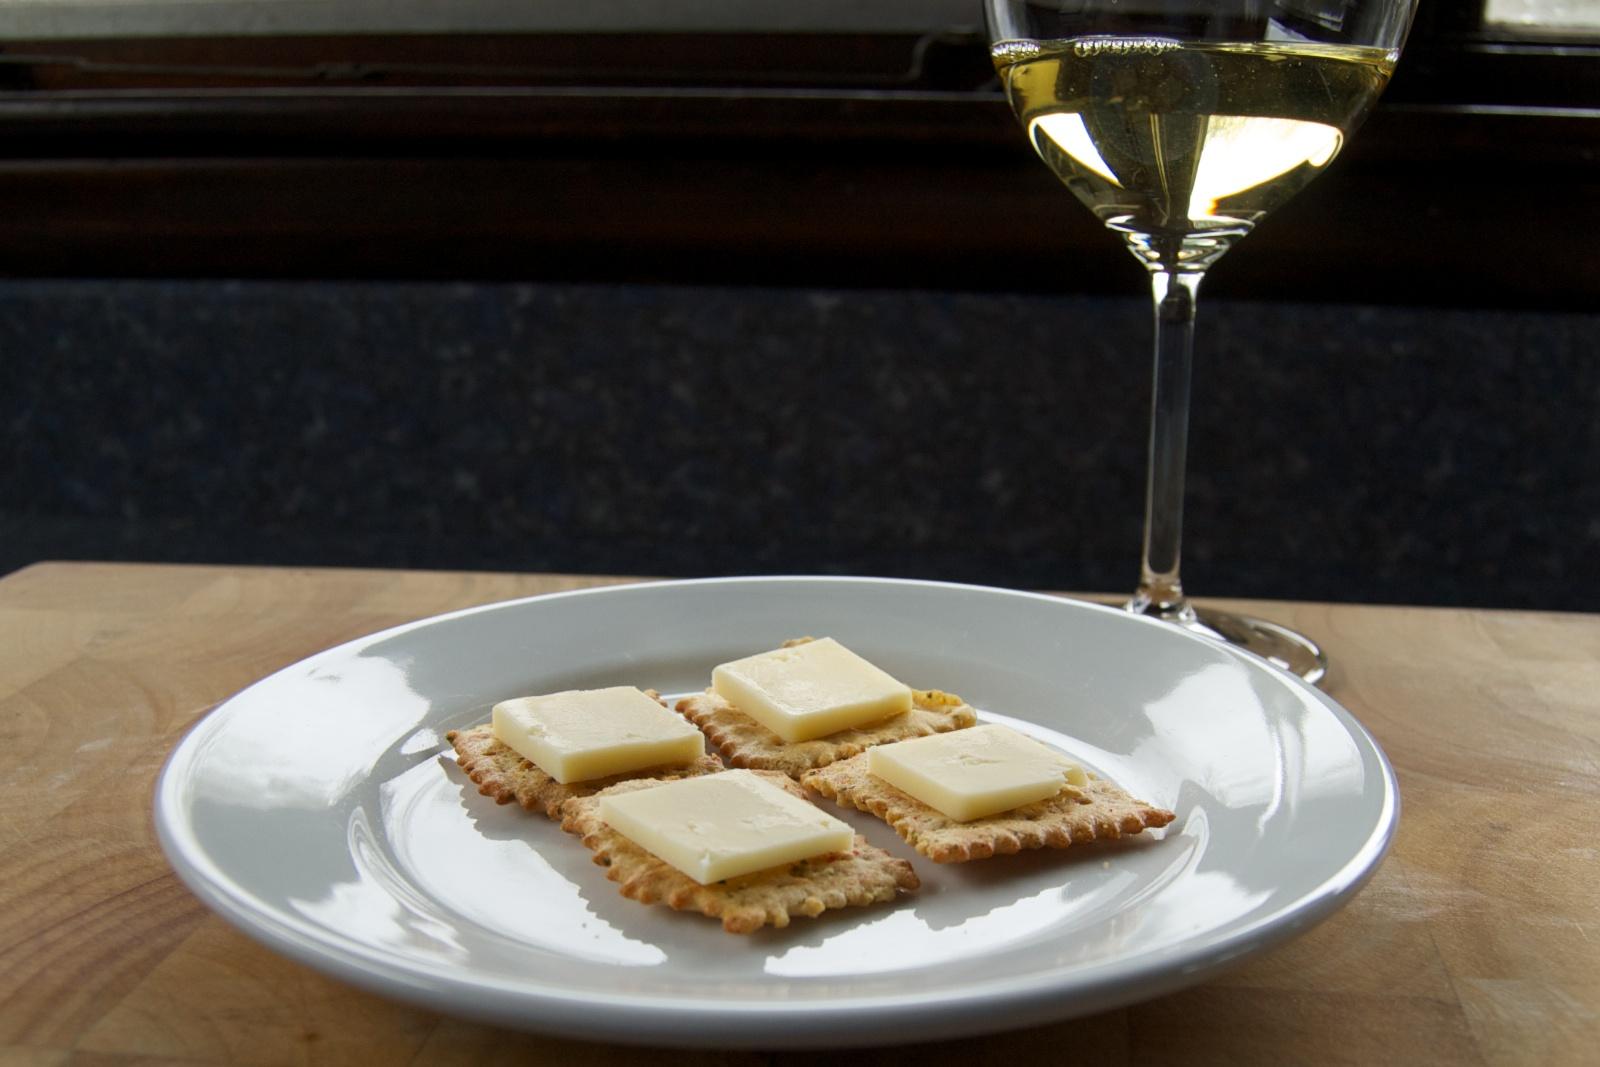 http://blog.rickk.com/food/2012/04/27/ate.2012.04.27.s.jpg